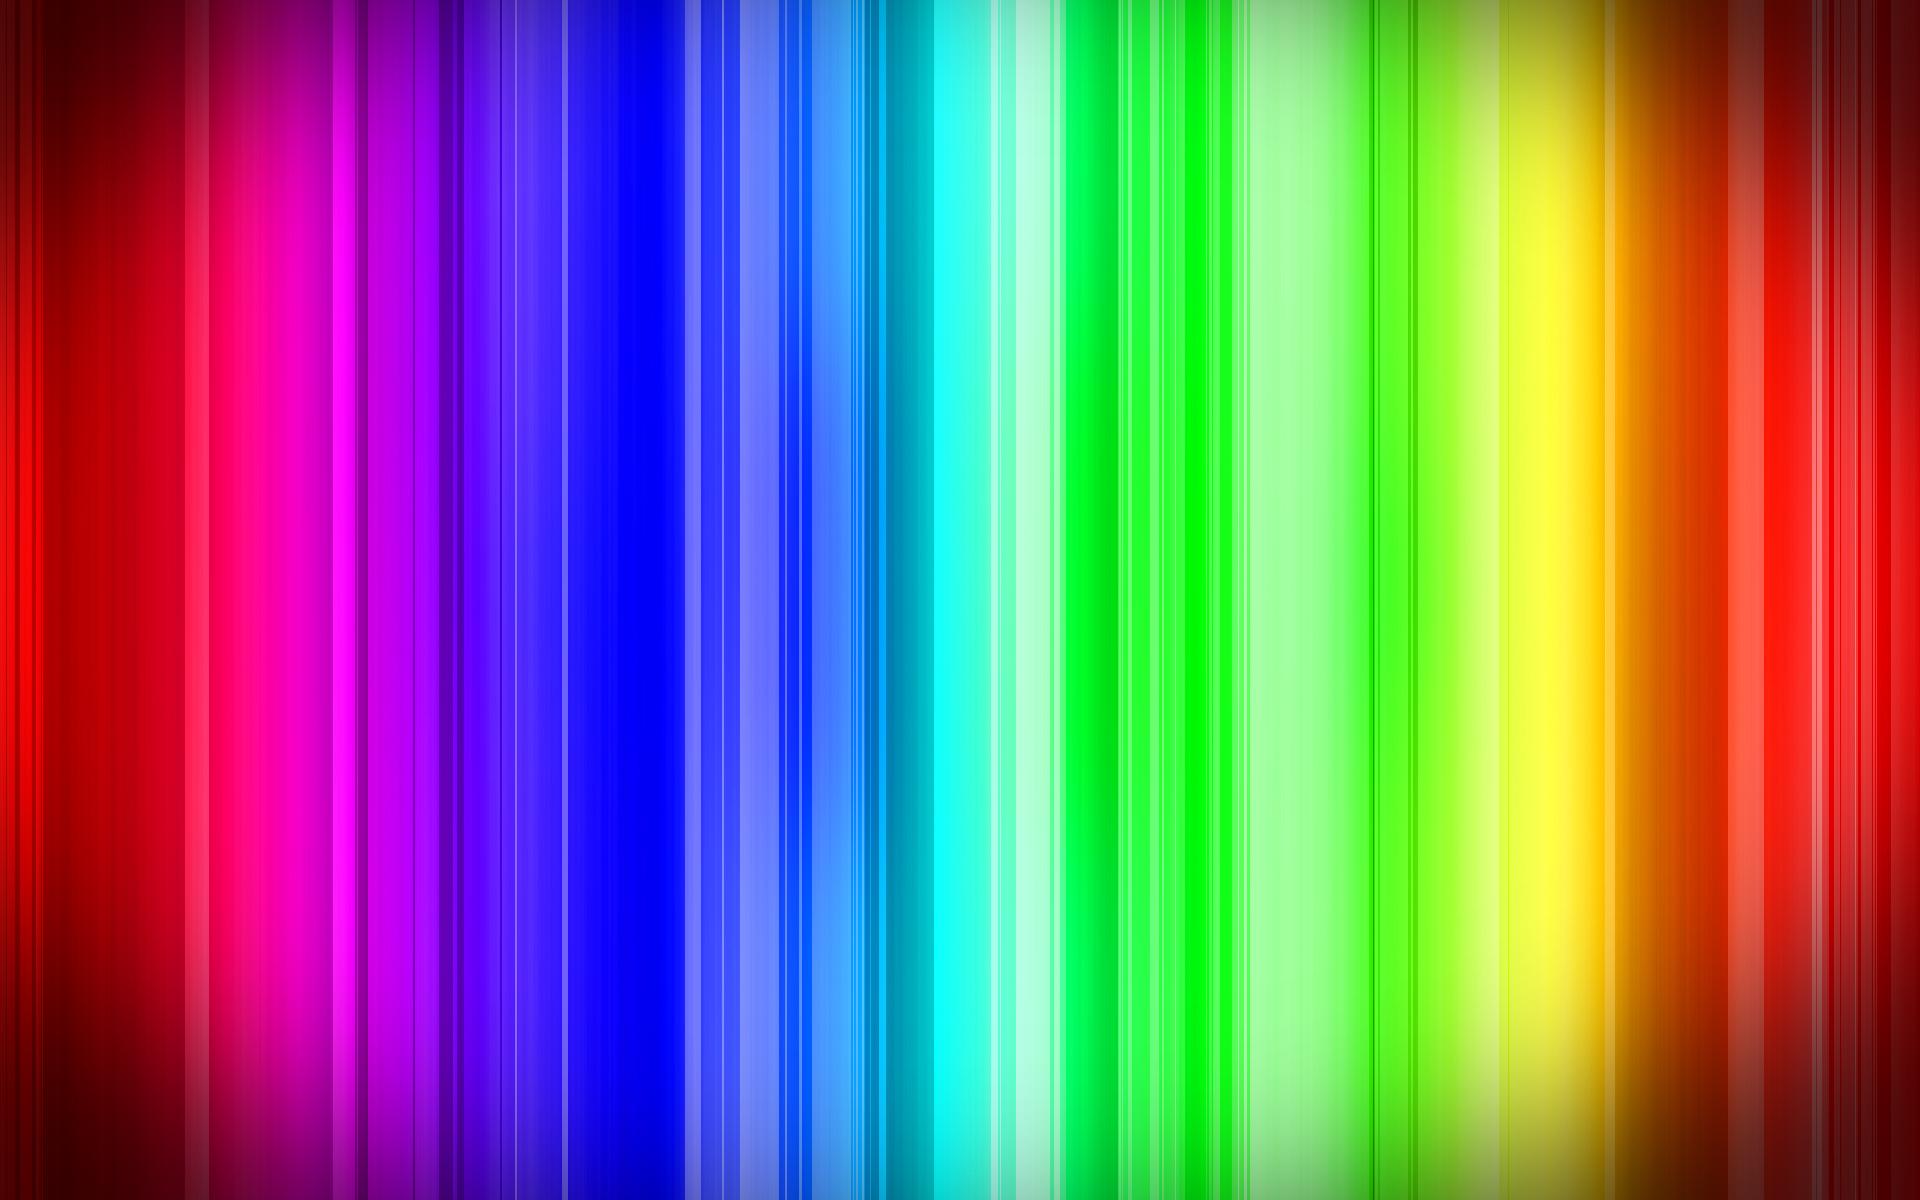 rainbow wave length wallpapers - photo #19